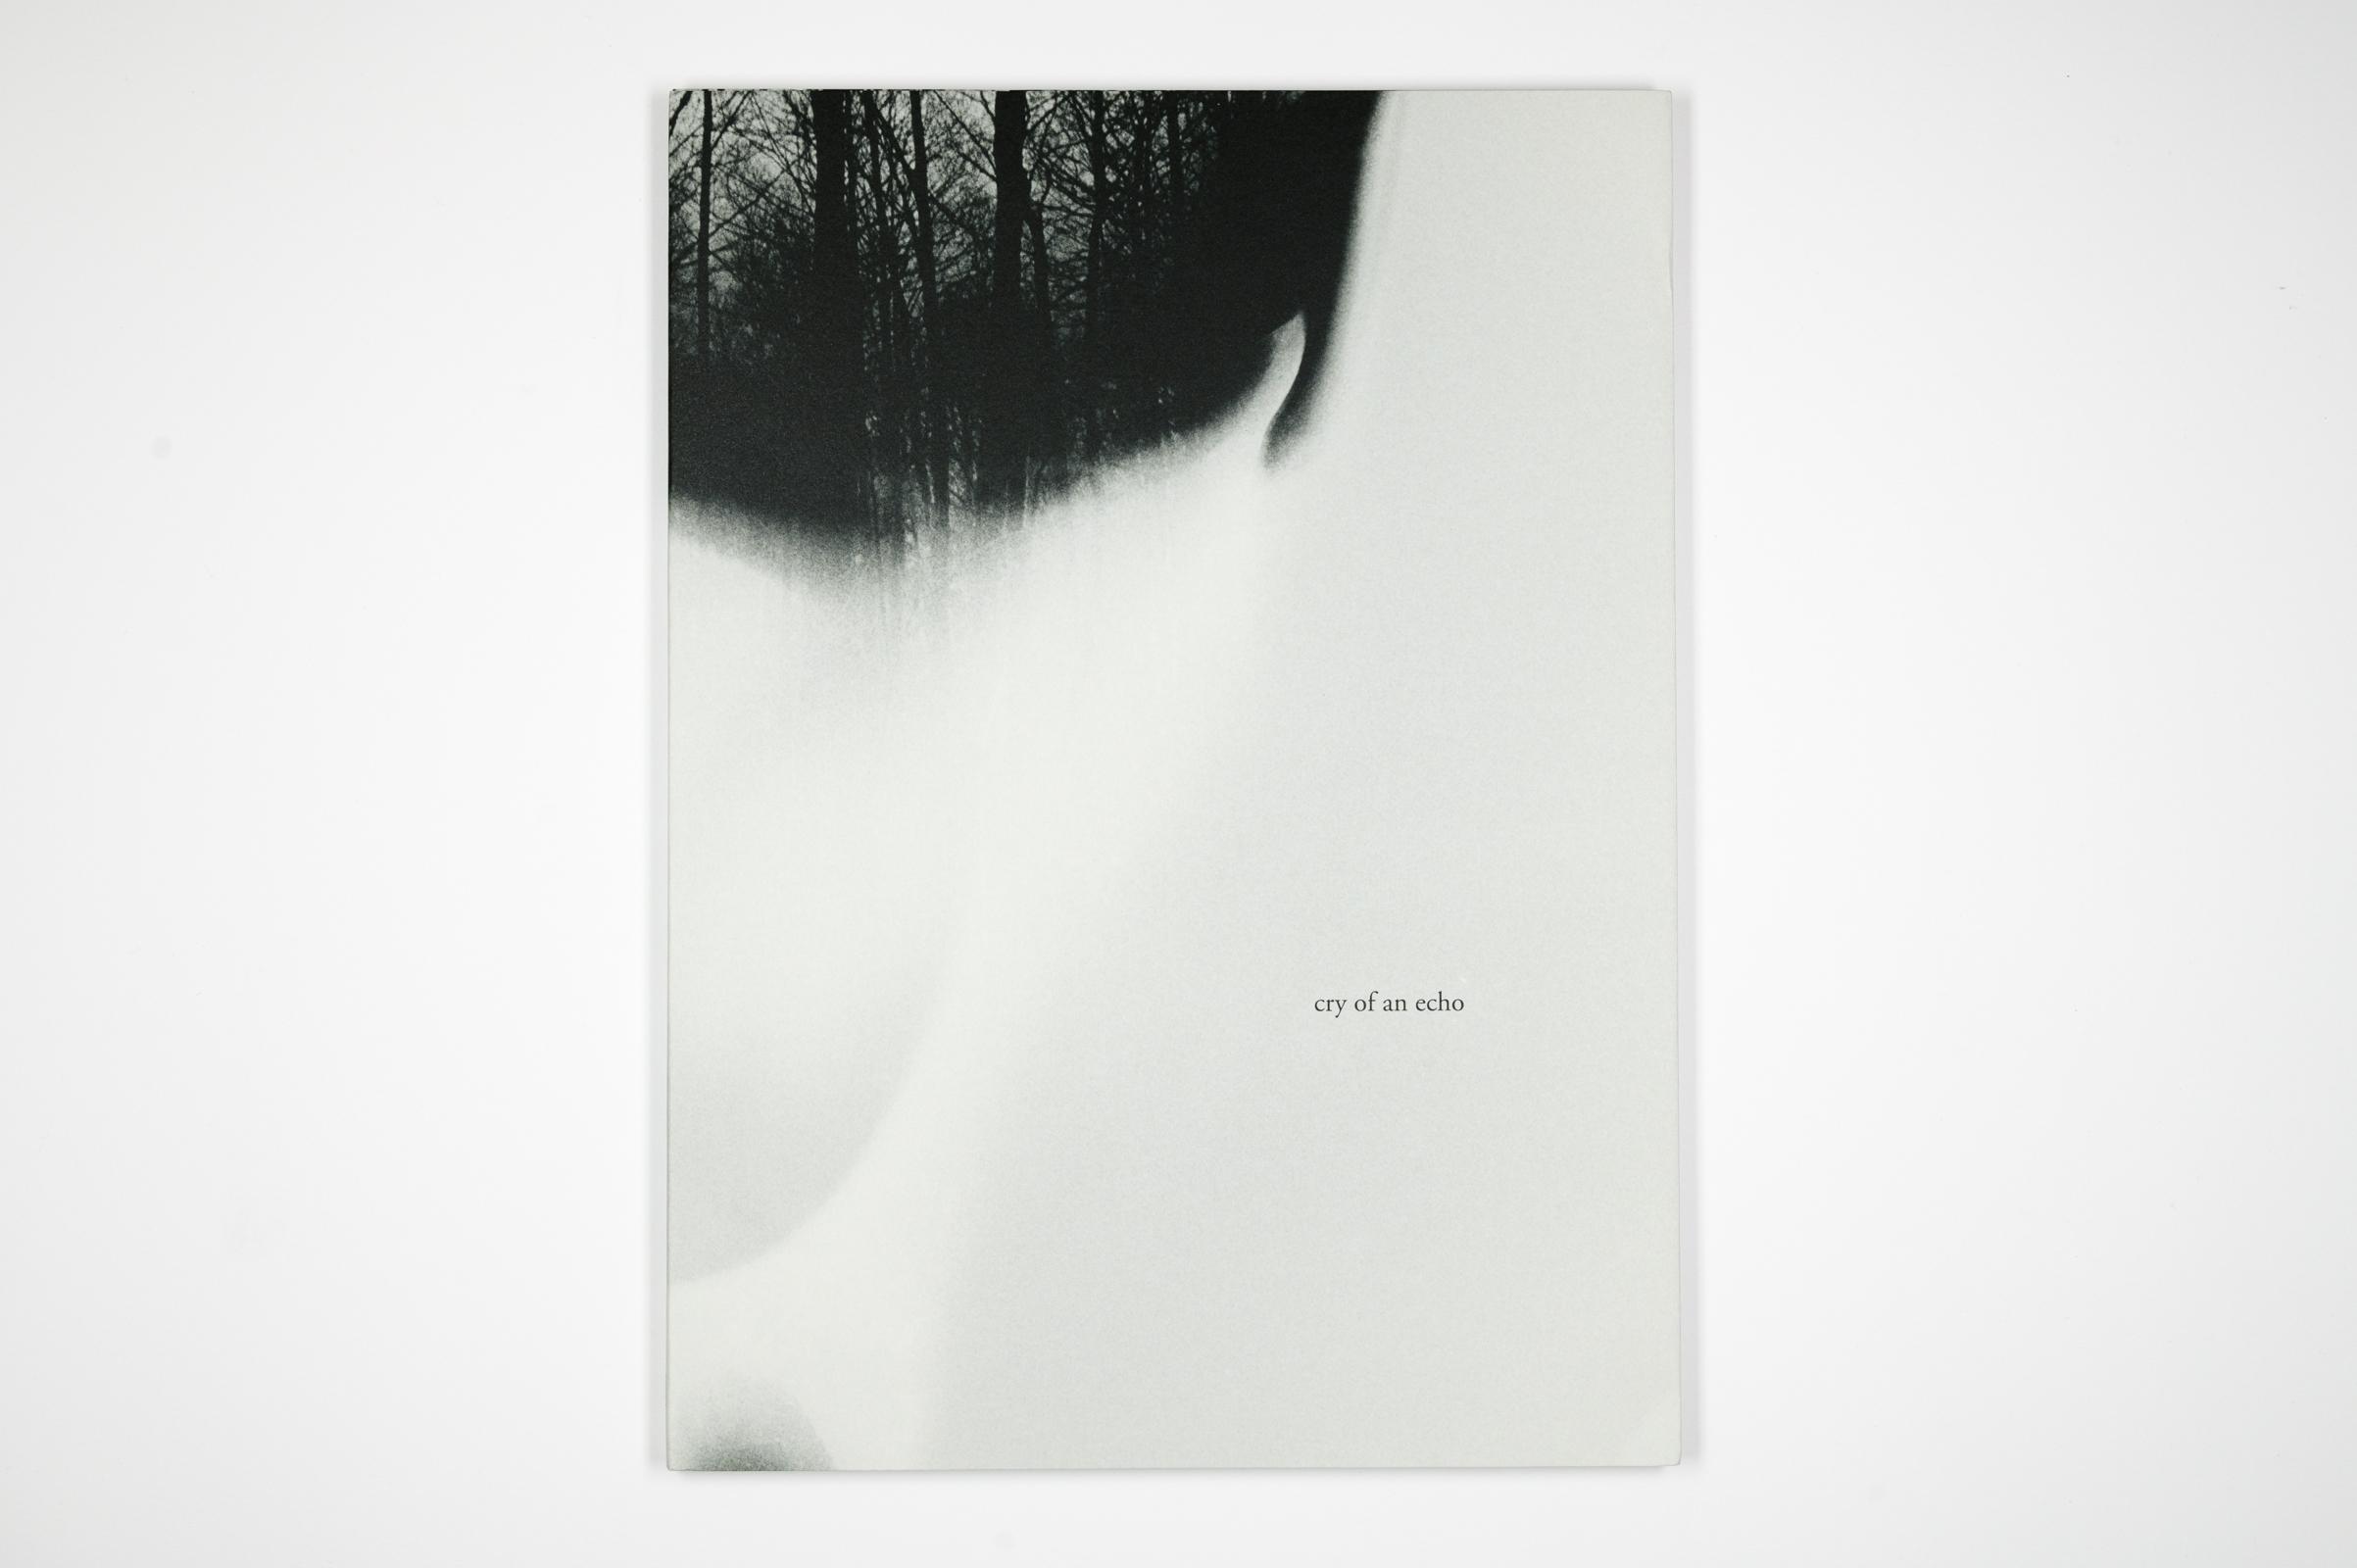 FOTOBOKFESTIVAL OSLO Books